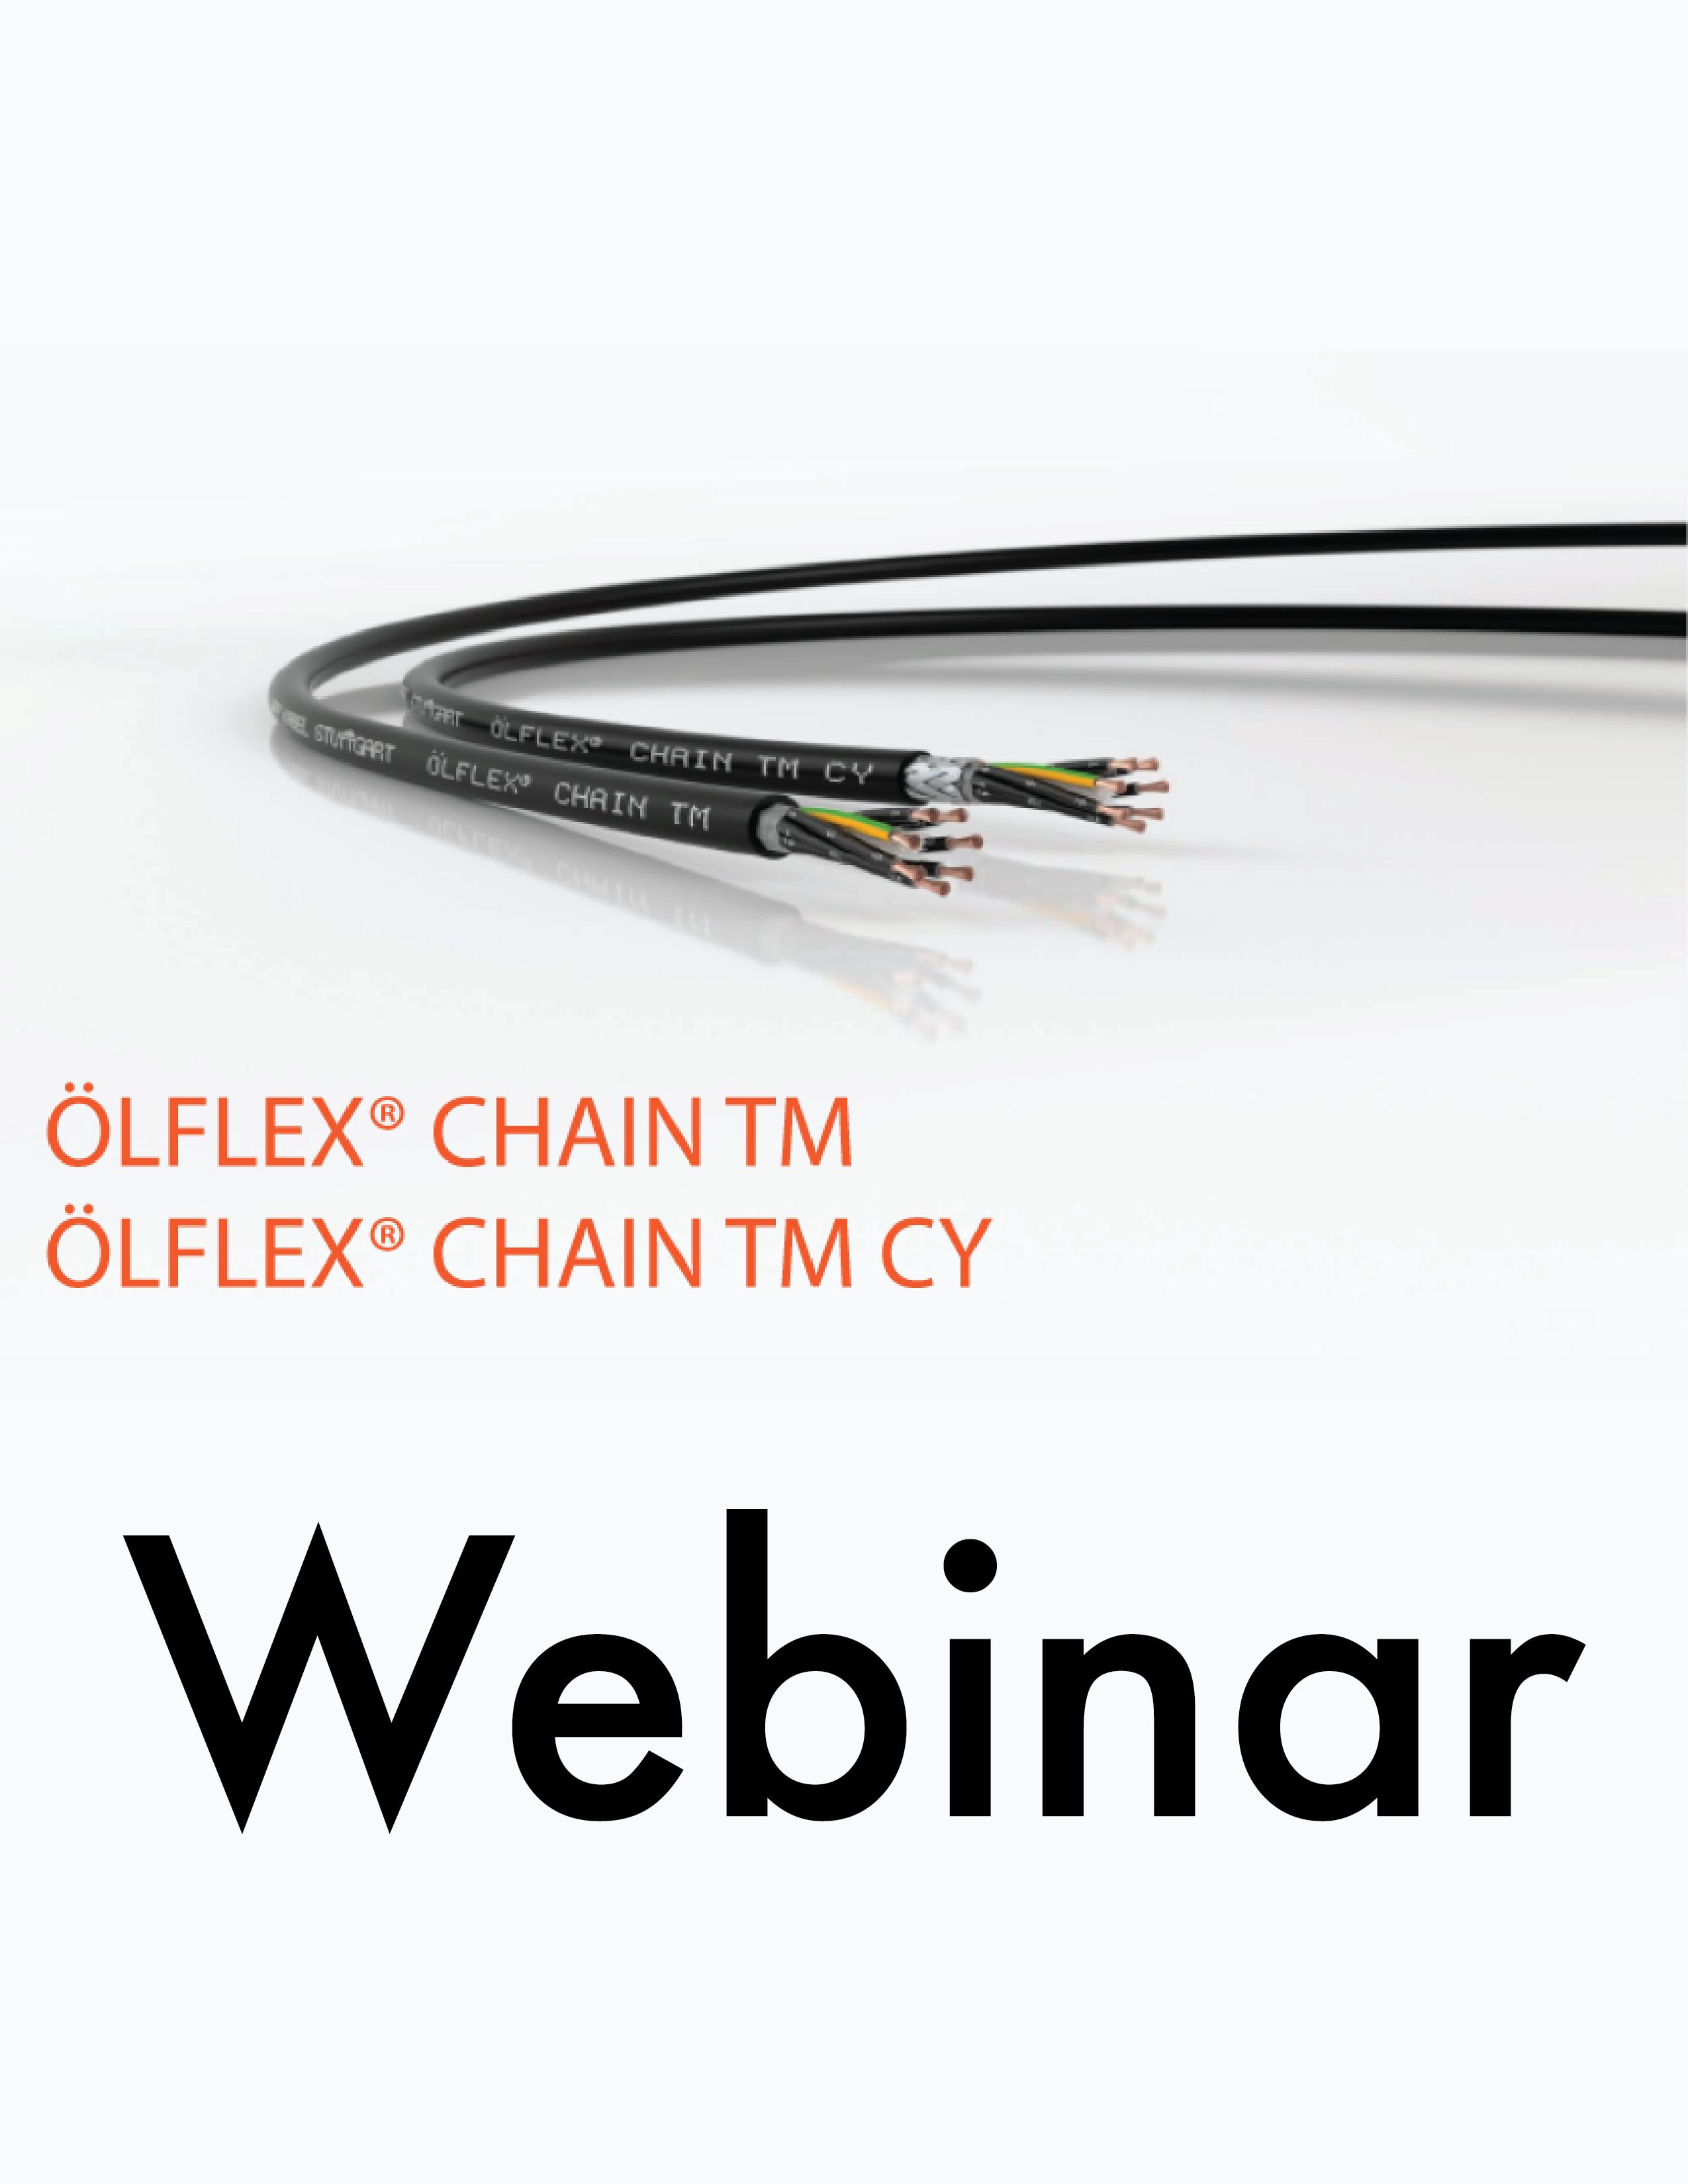 olflex-chain